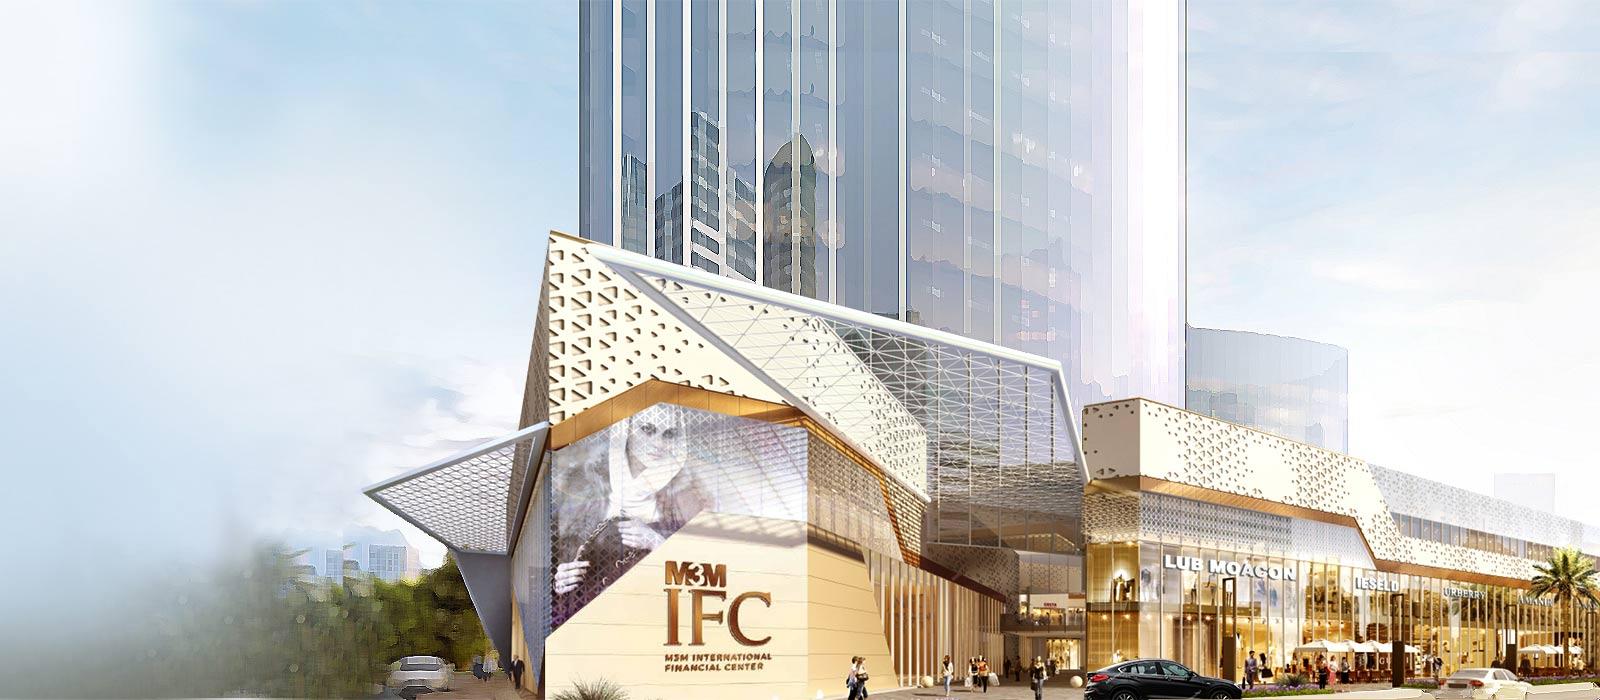 M3M IFC - M3M International Financial Center